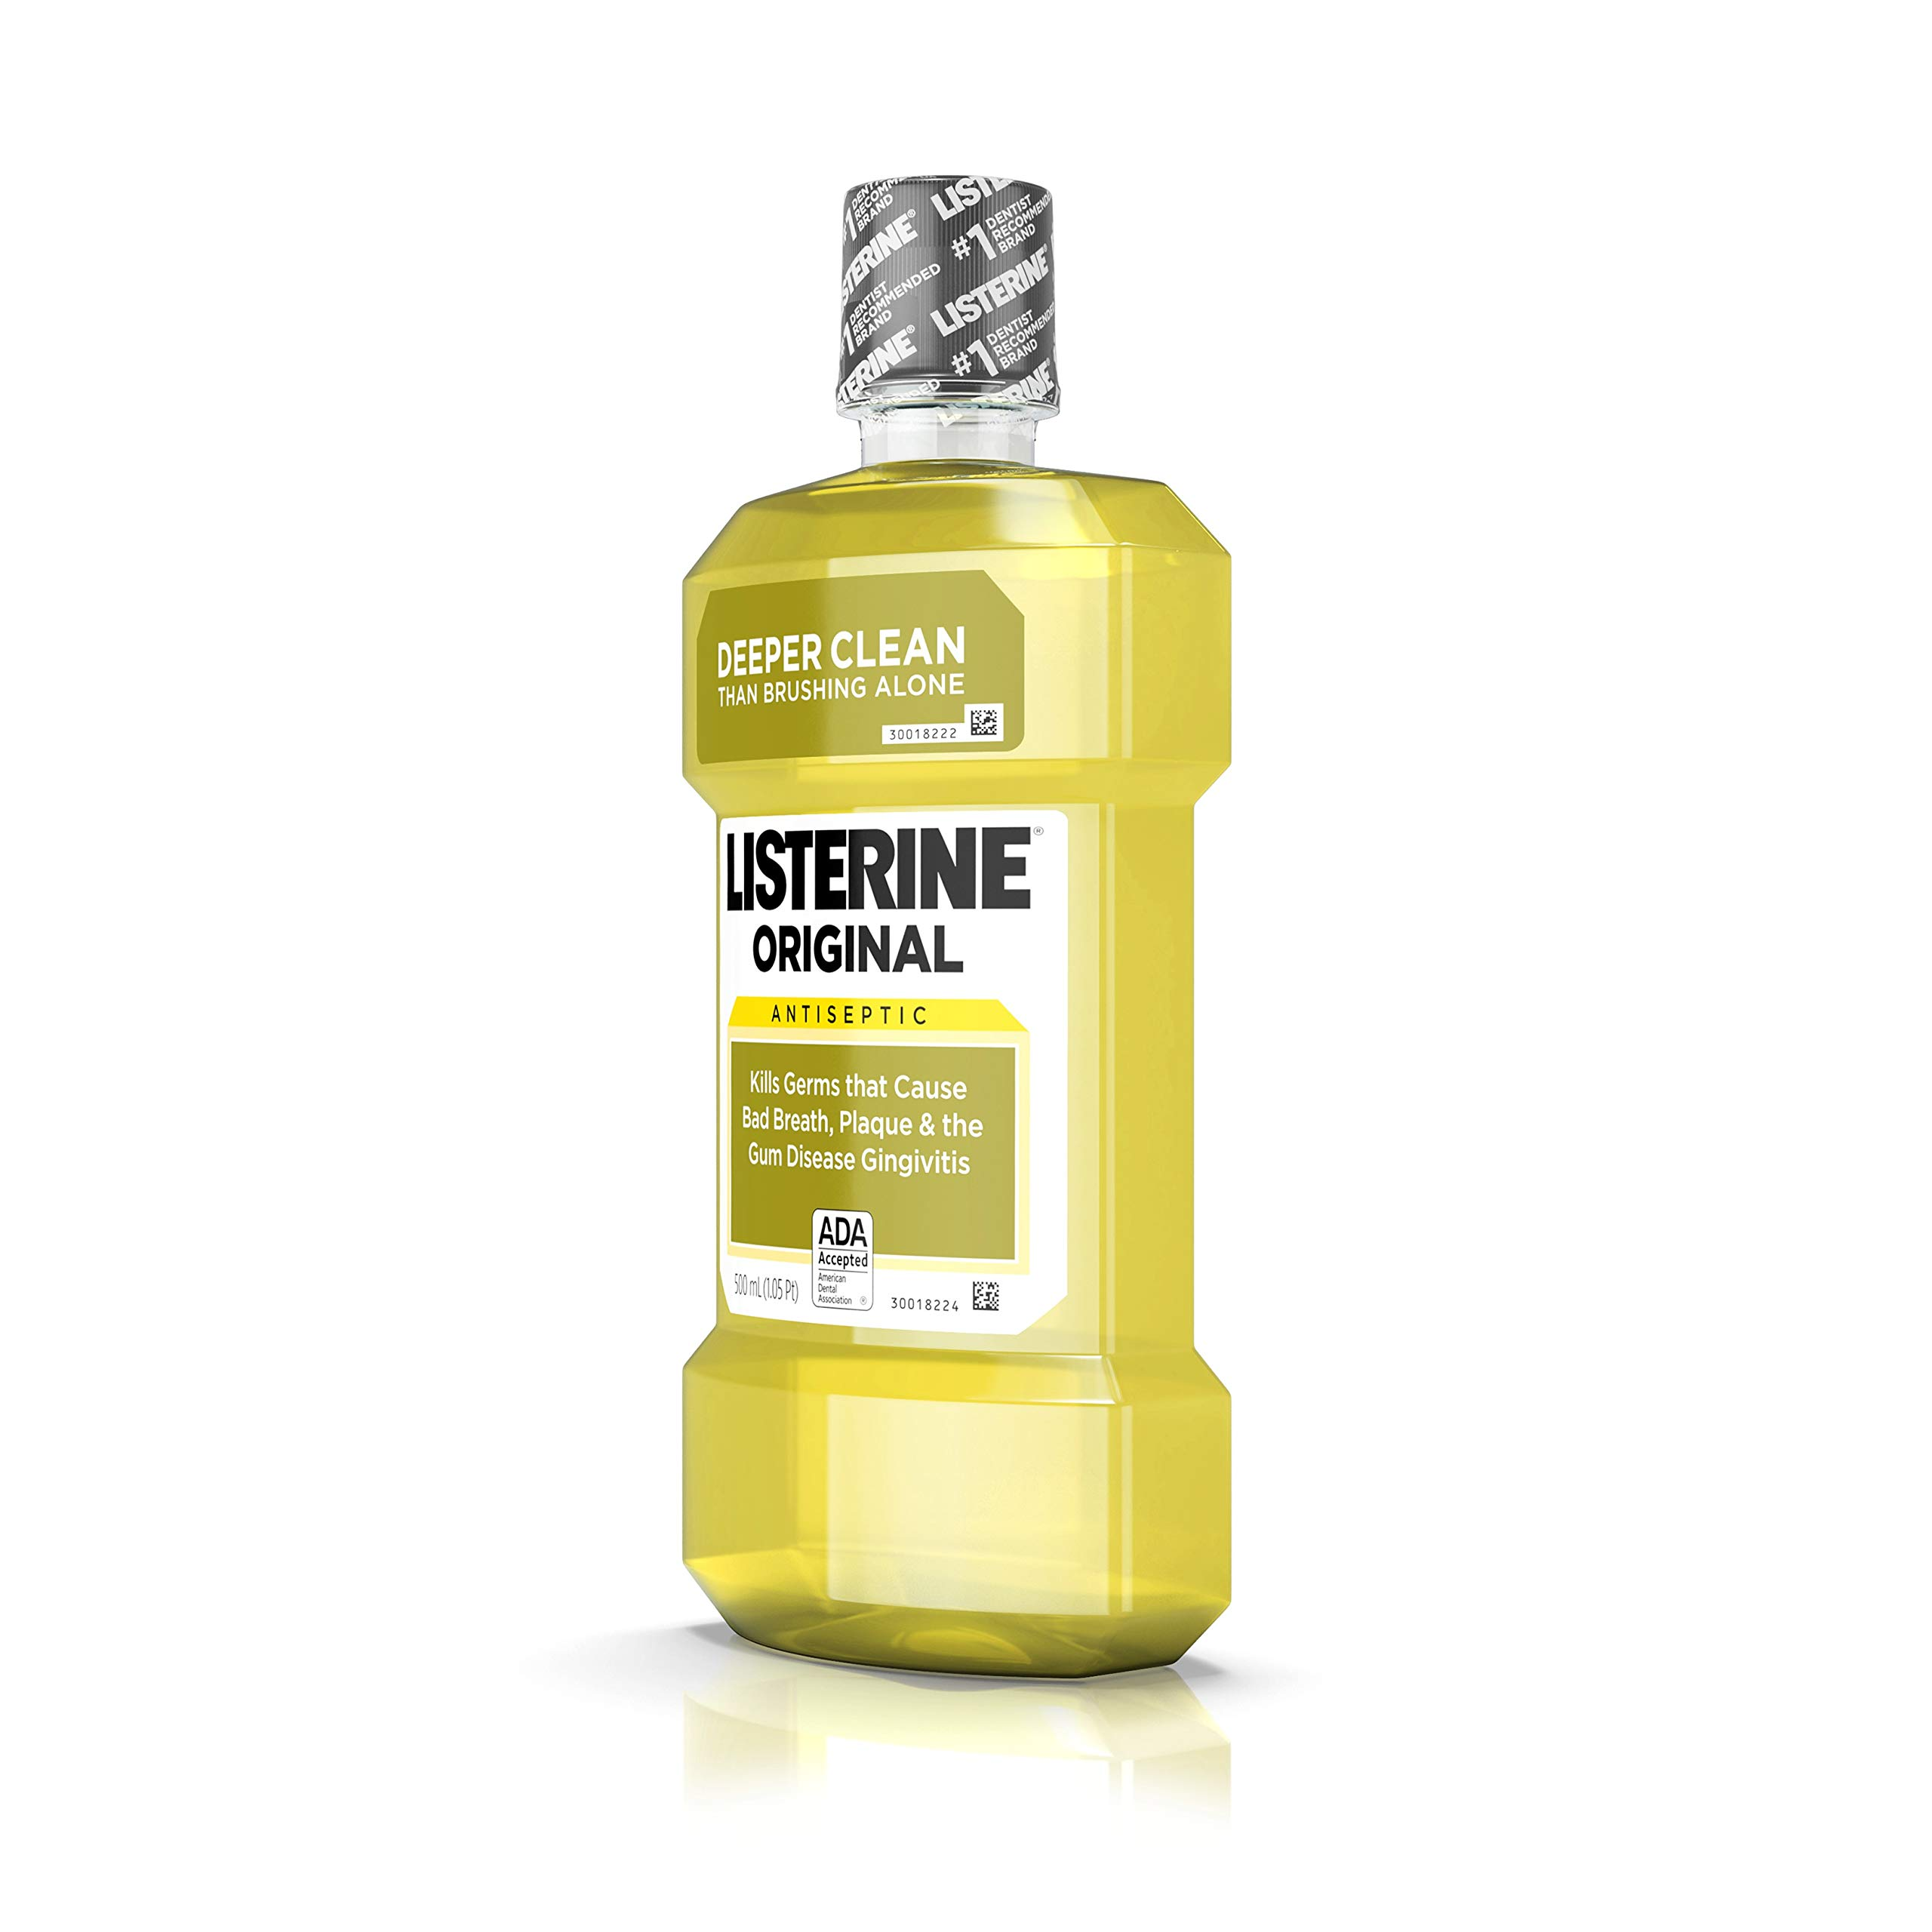 Listerine Original Antiseptic Mouthwash 500 mL (Packs of 4)